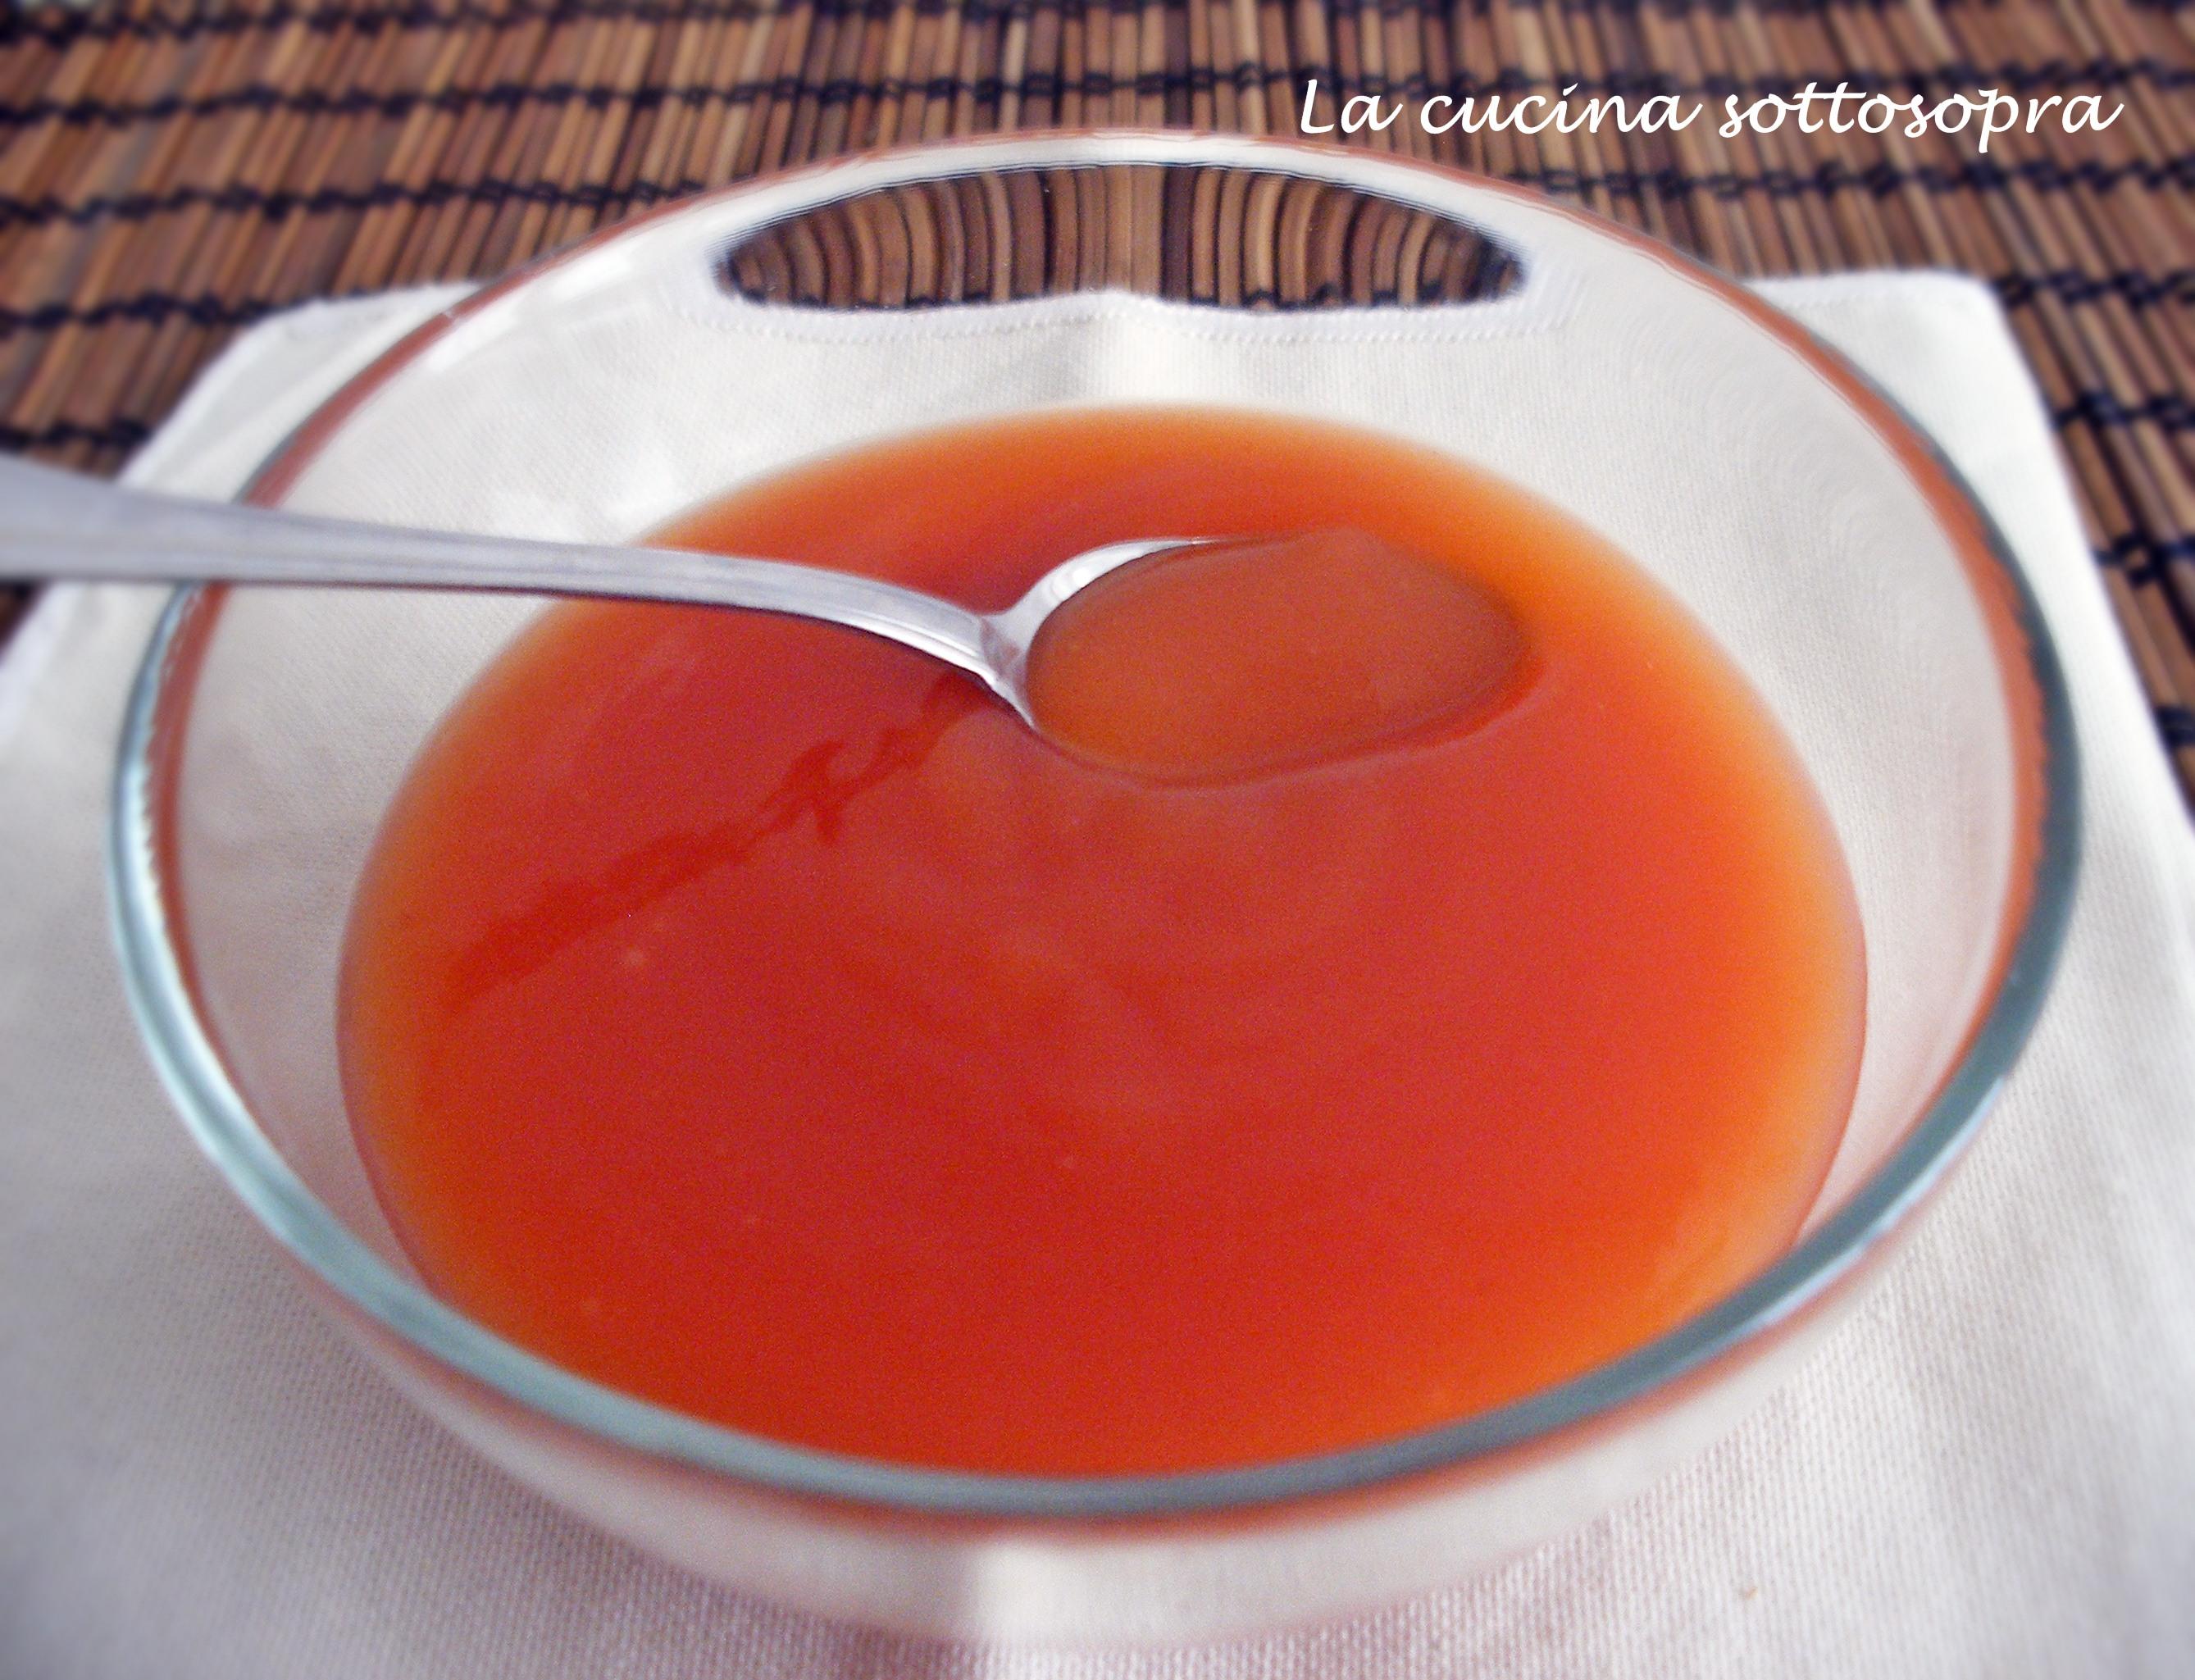 Salsa agrodolce cinese la cucina sottosopra for Una salsa da cucina cinese